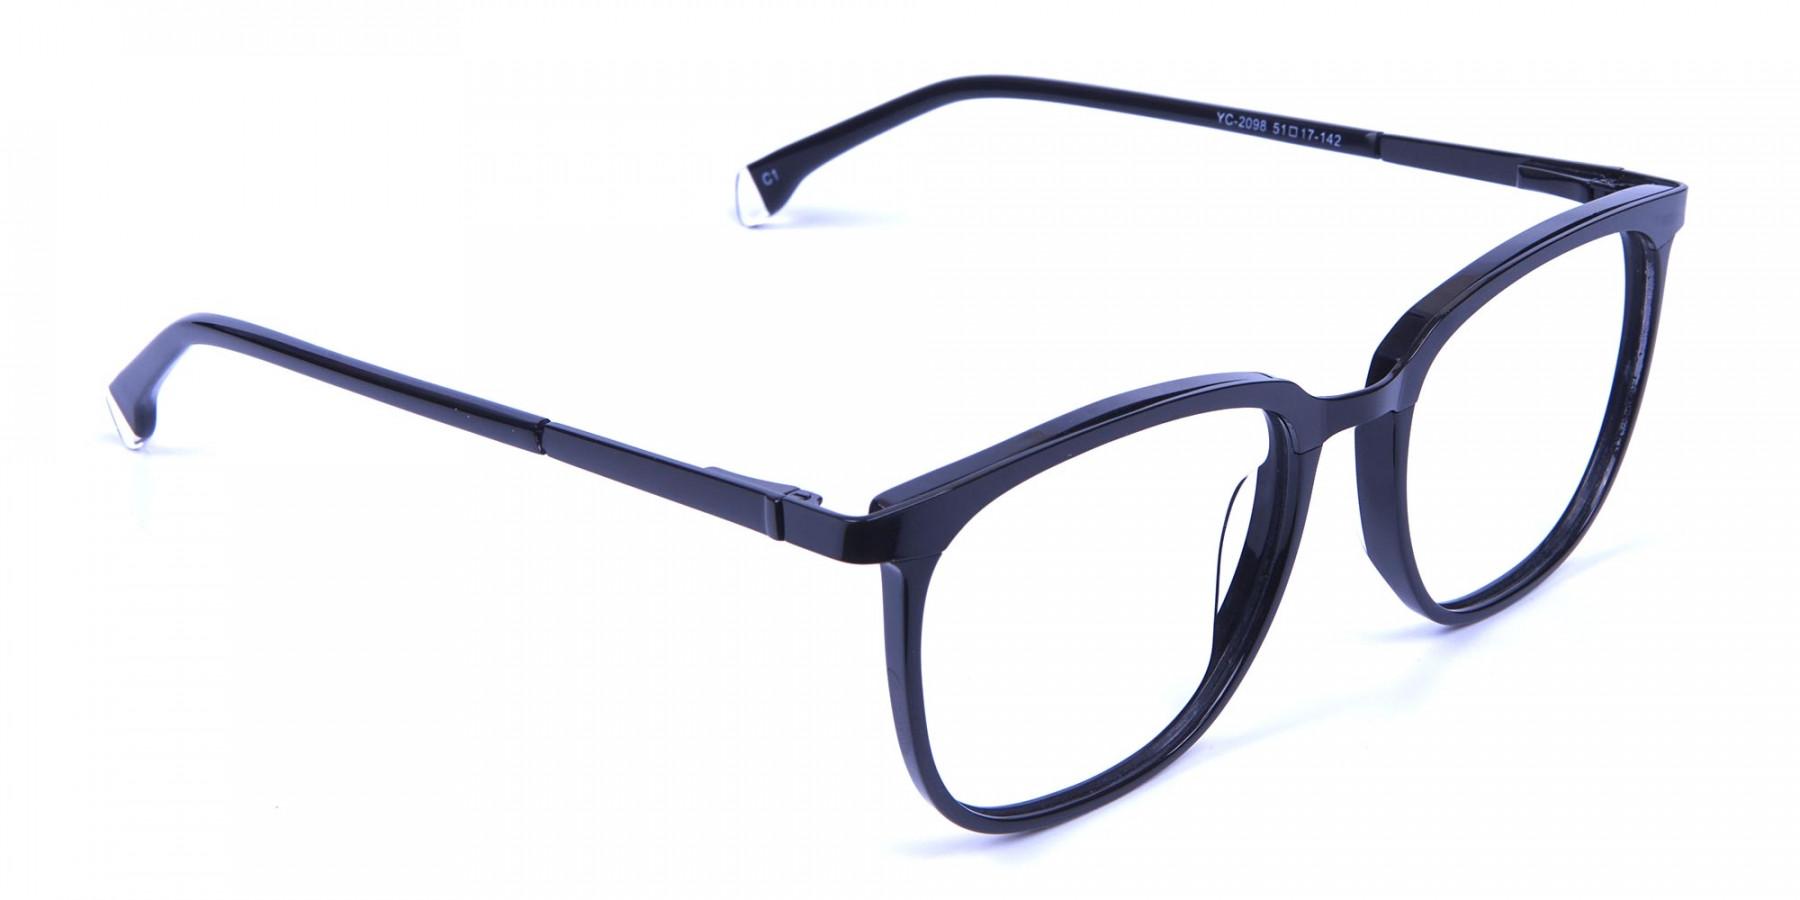 Wayfarer & Square Black Glasses